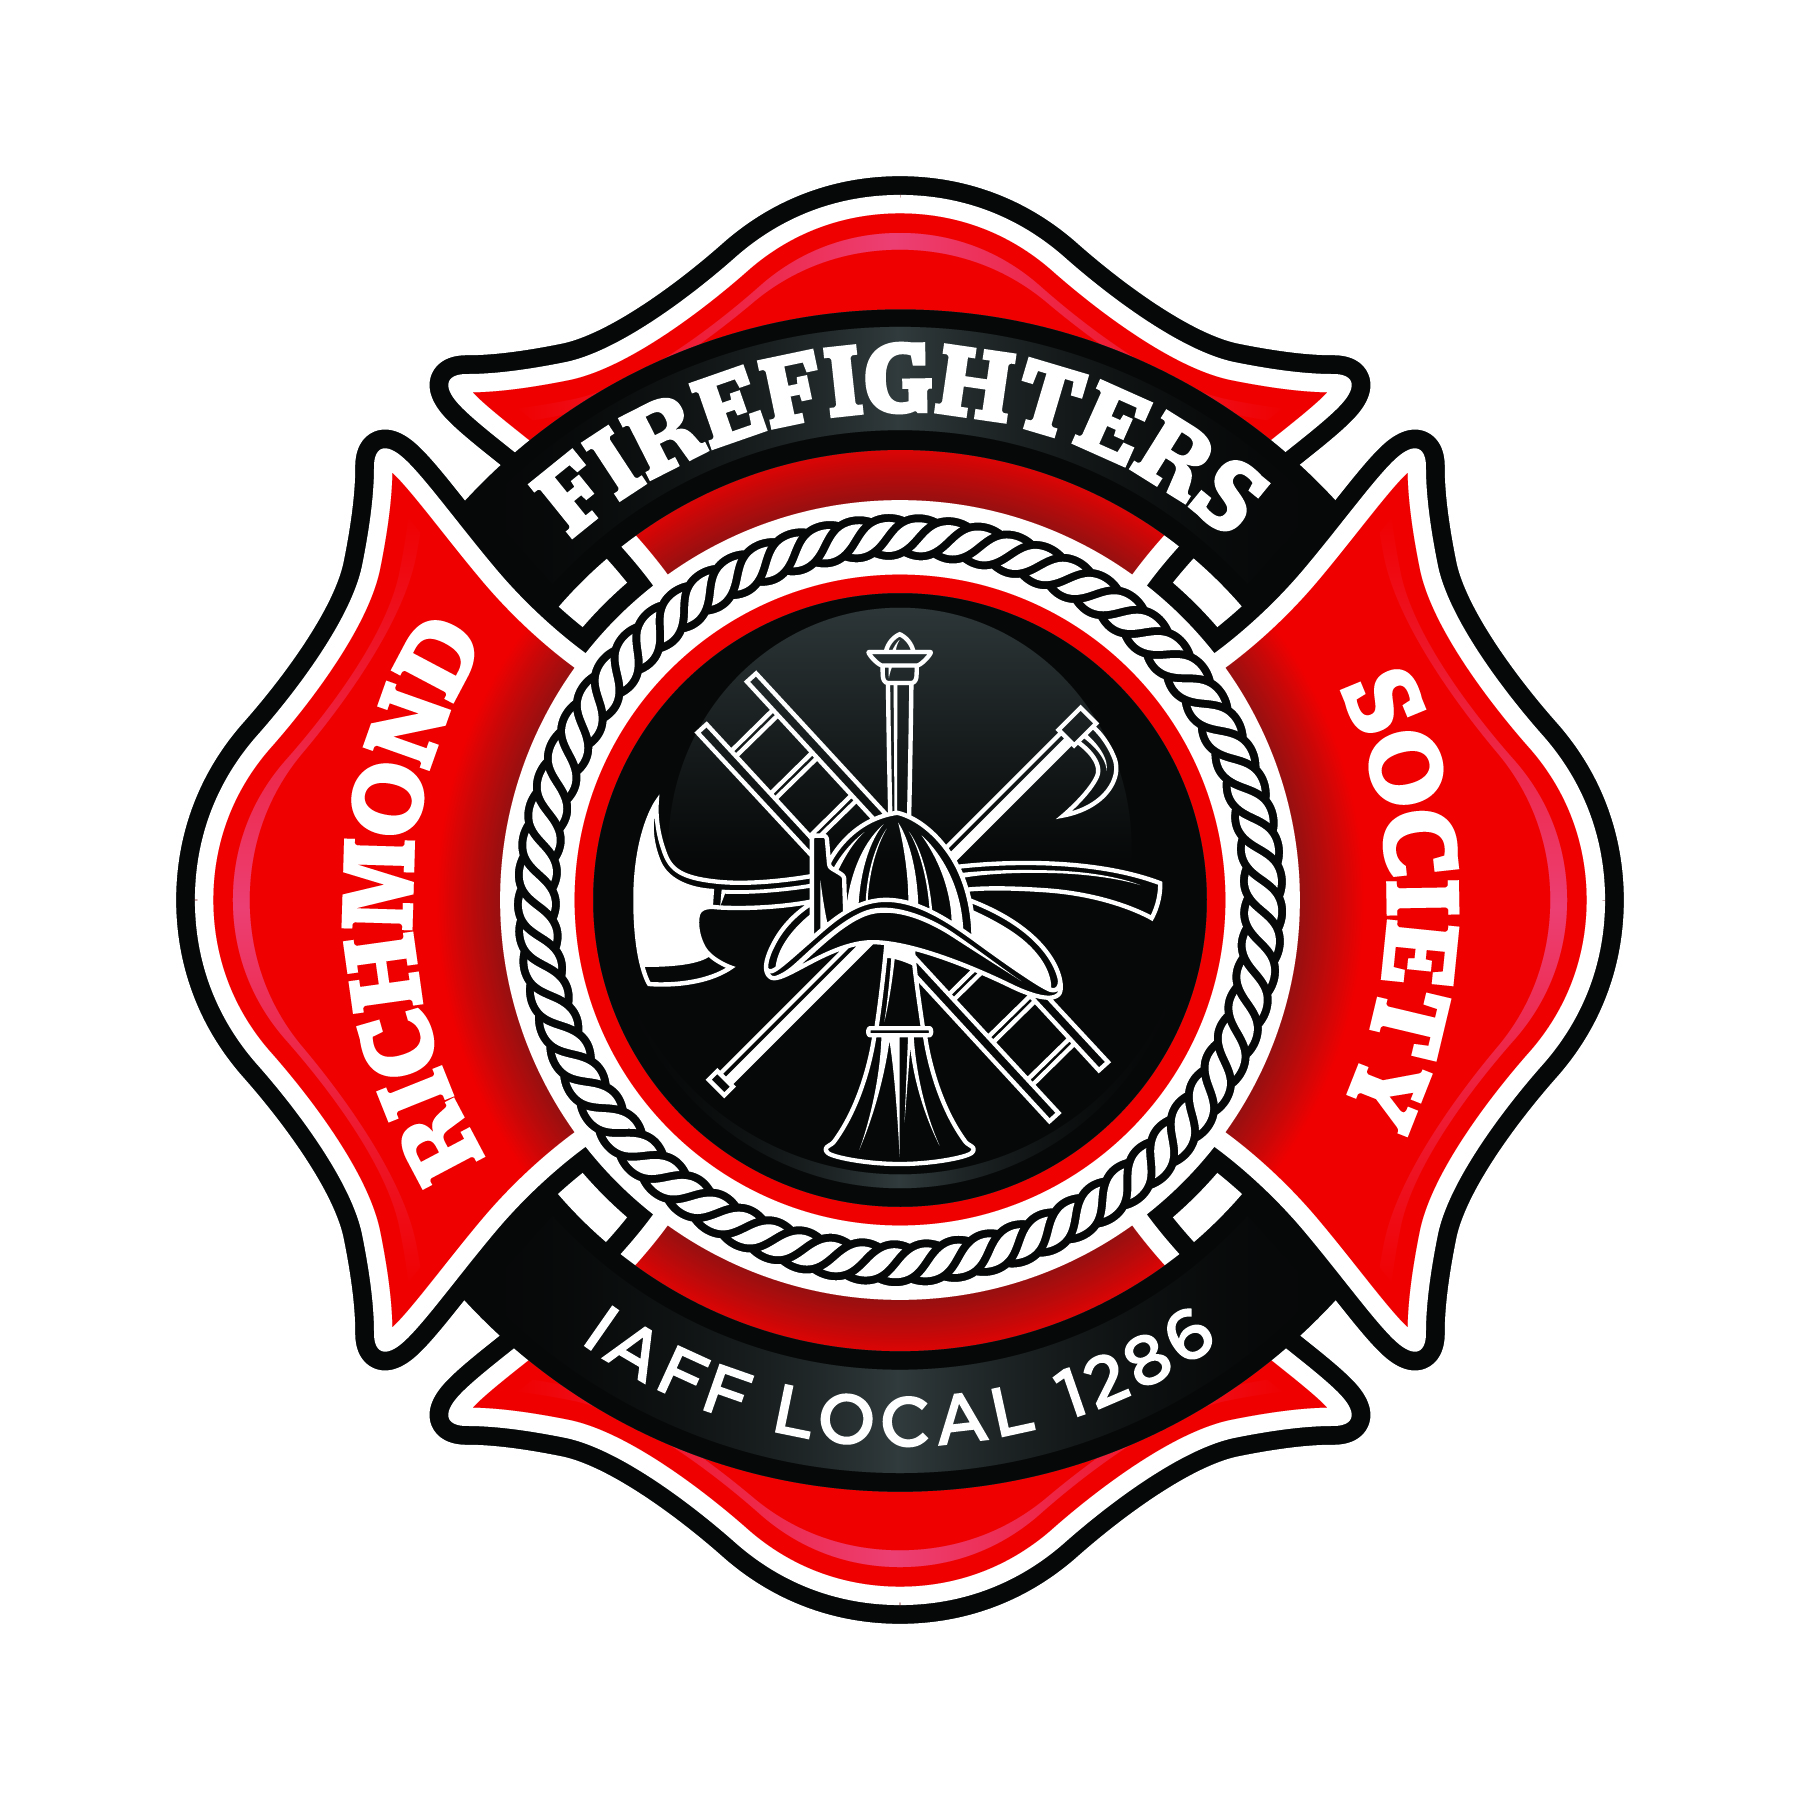 Fireman Logo Free Vector Art  14 Free Downloads  Vecteezy